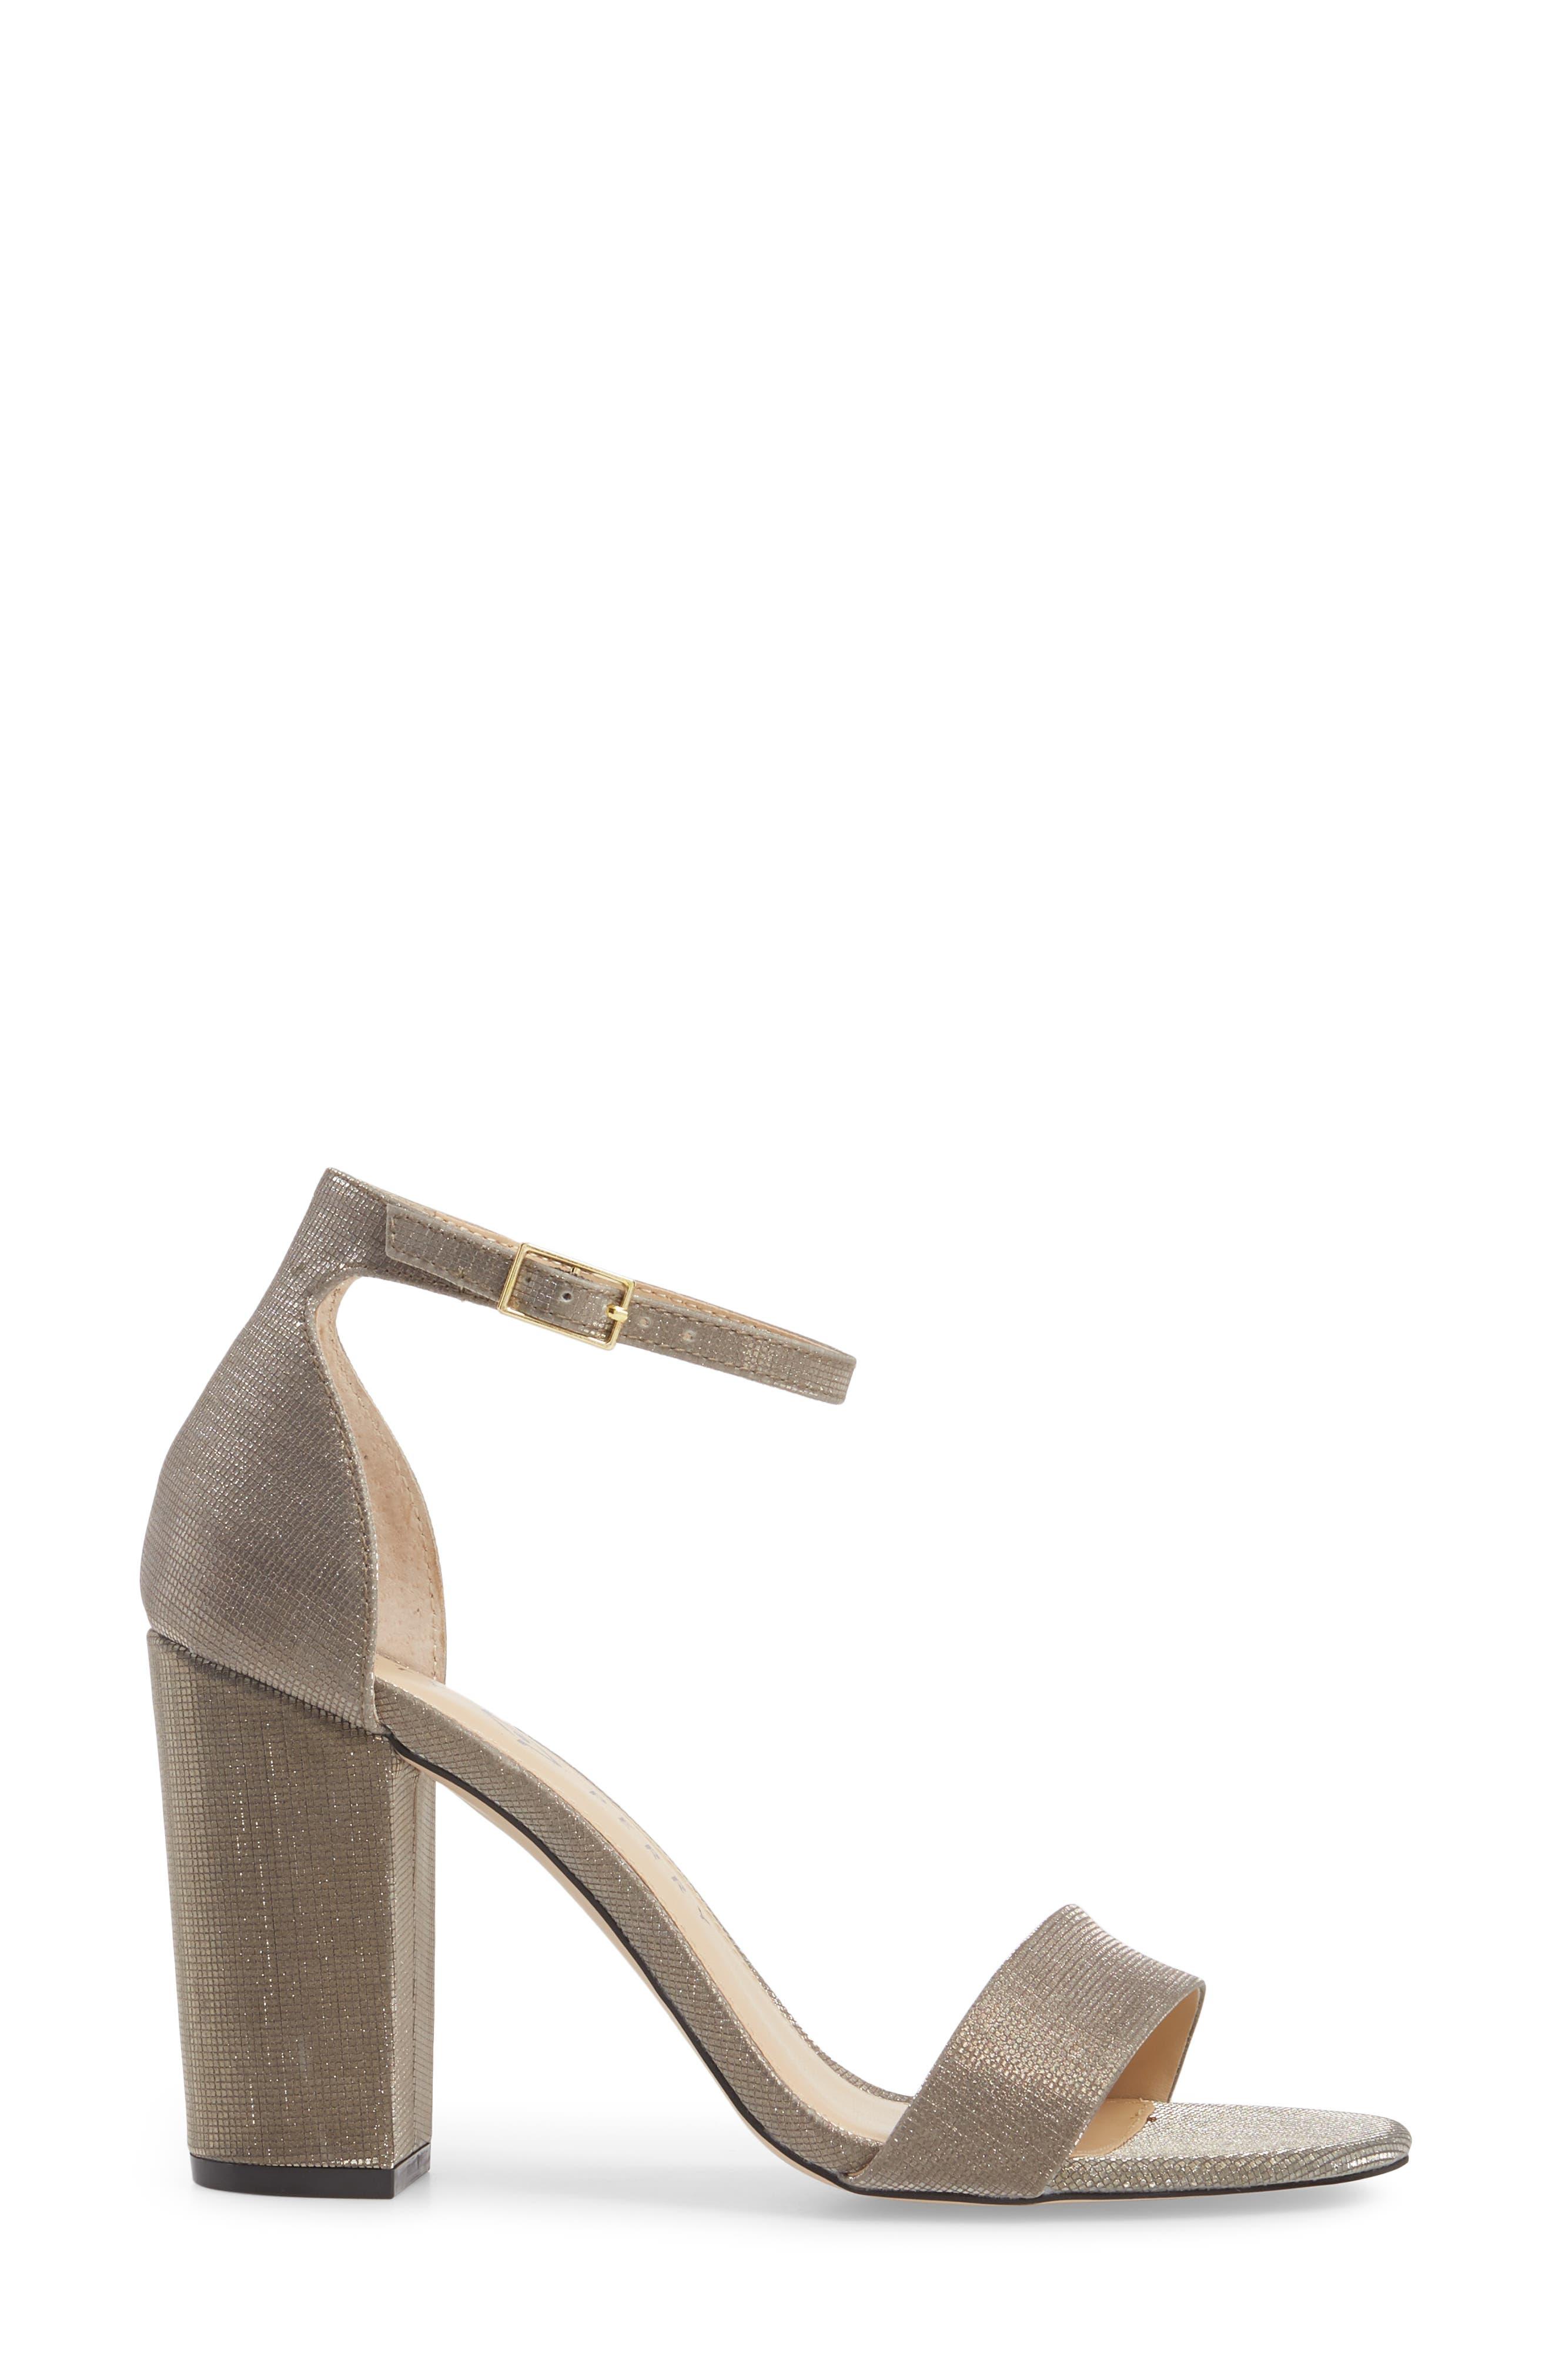 Ankle Strap Sandal,                             Alternate thumbnail 6, color,